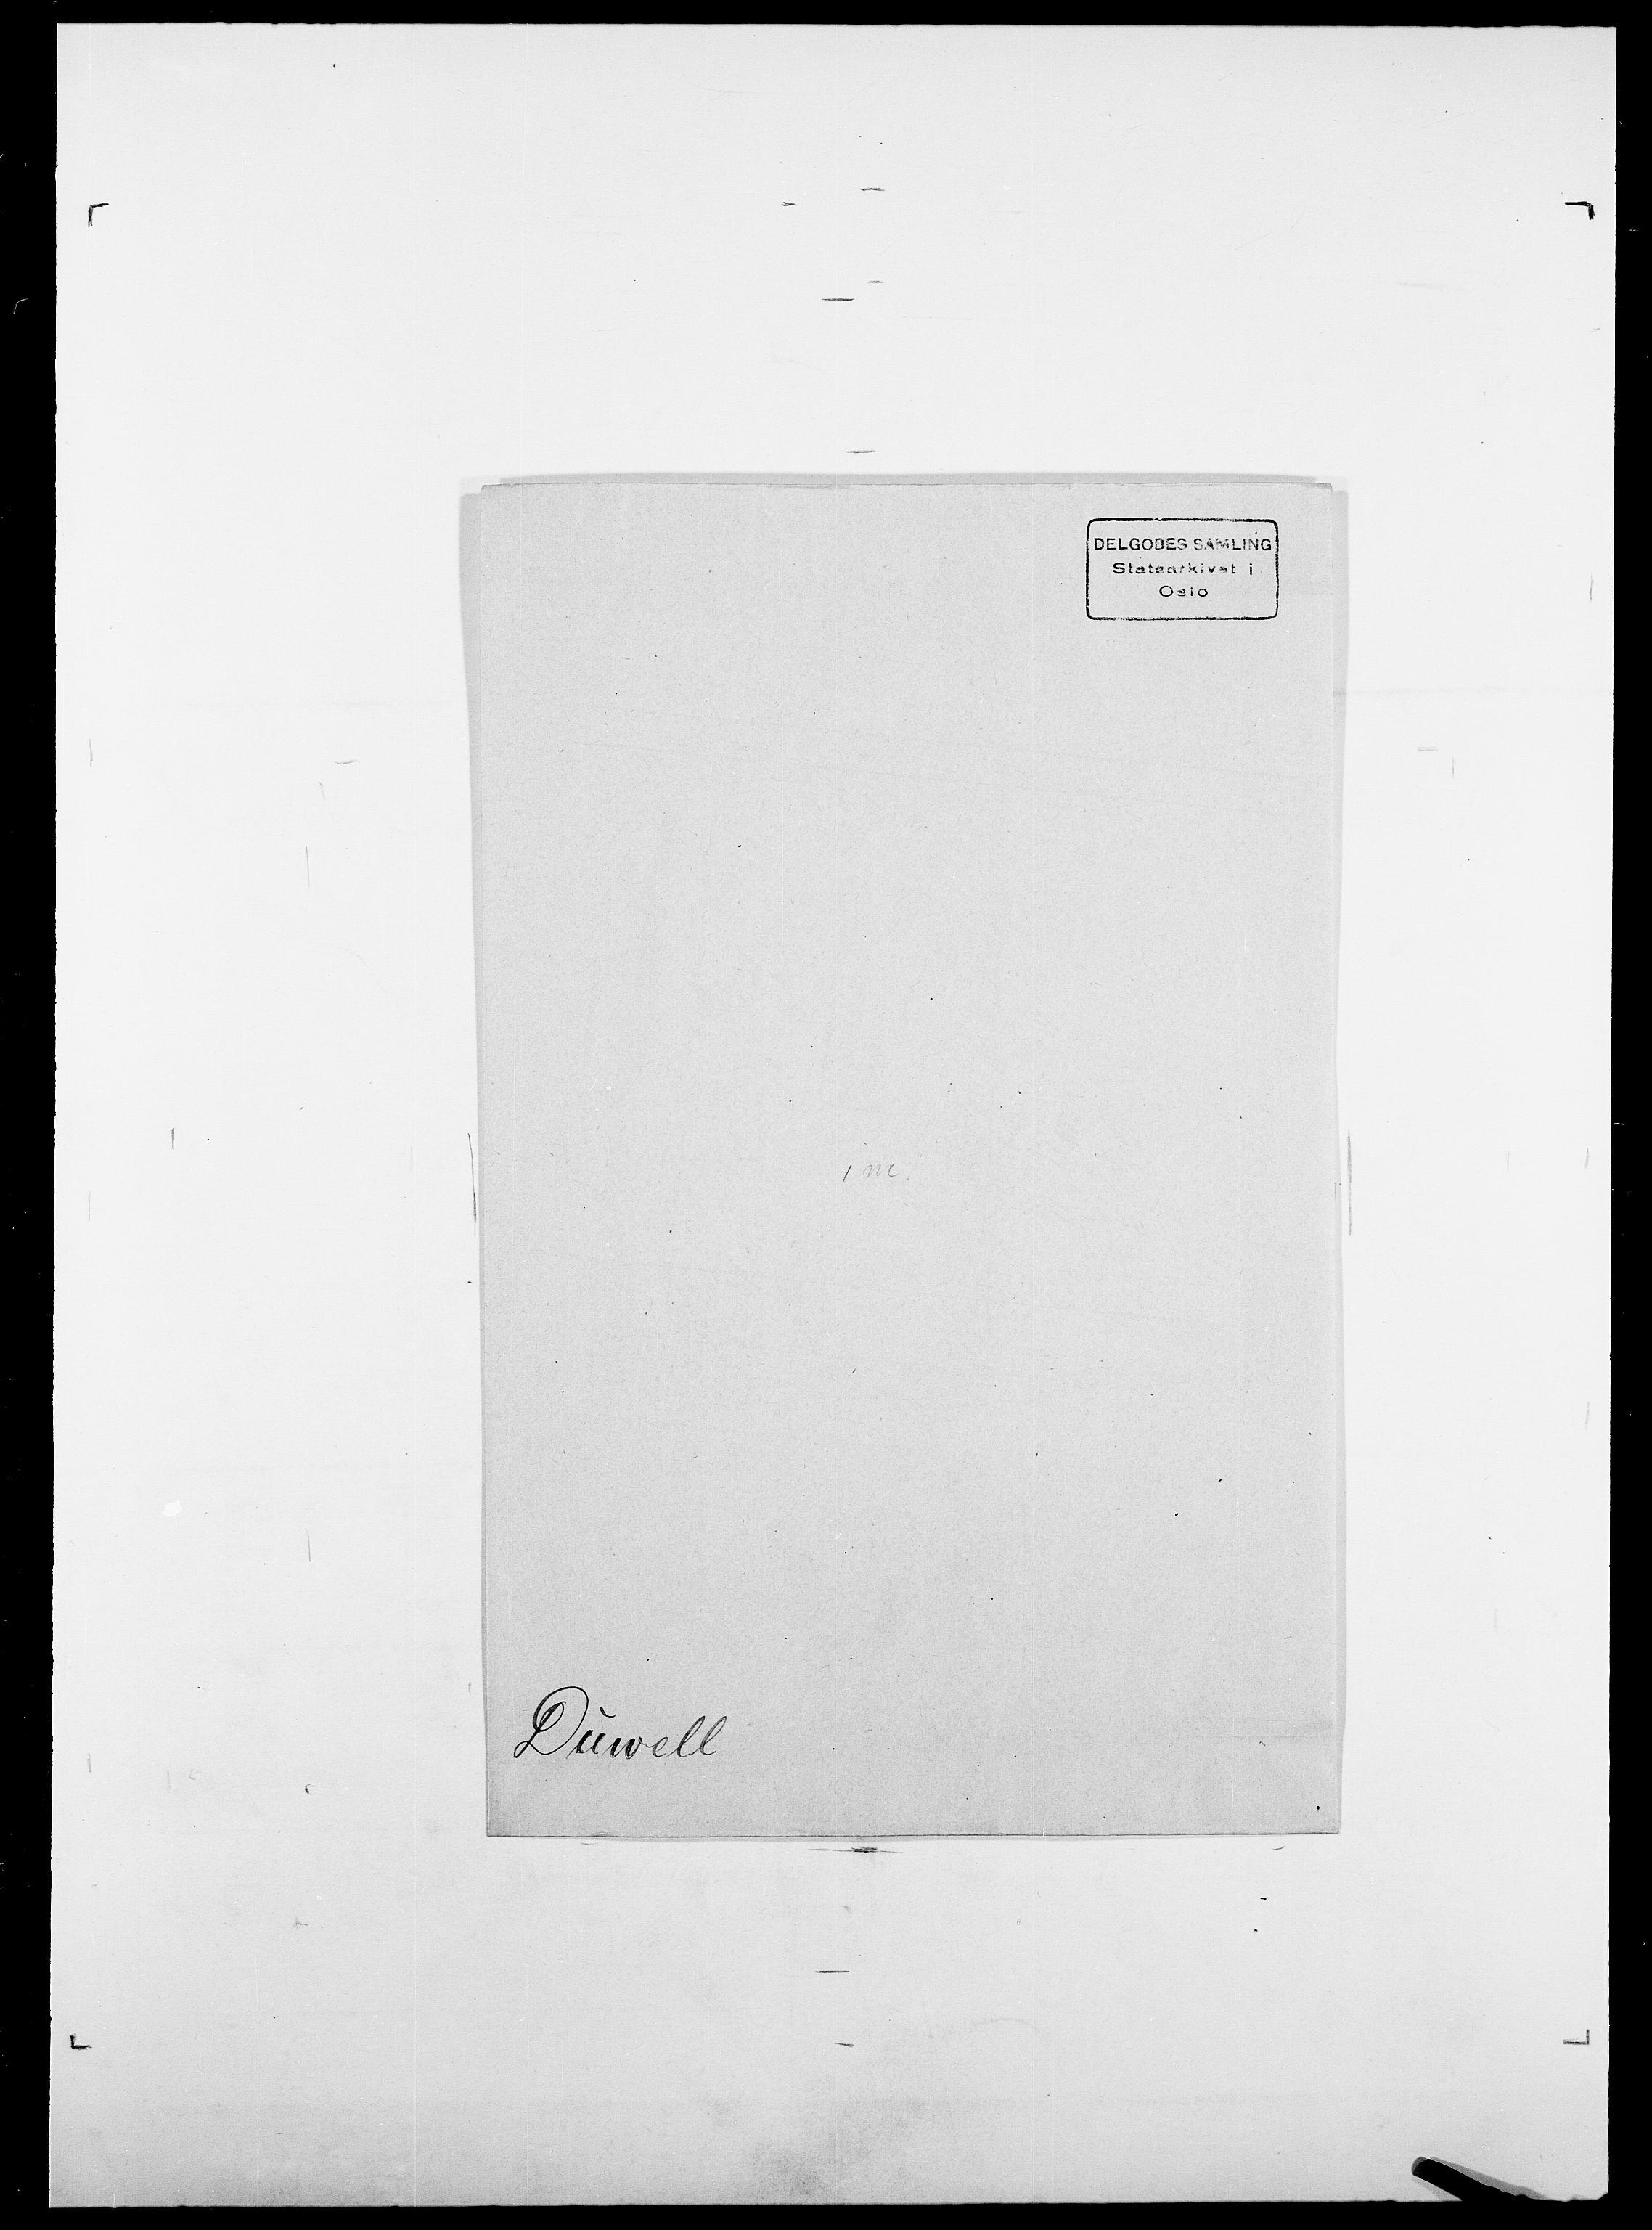 SAO, Delgobe, Charles Antoine - samling, D/Da/L0009: Dahl - v. Düren, s. 872